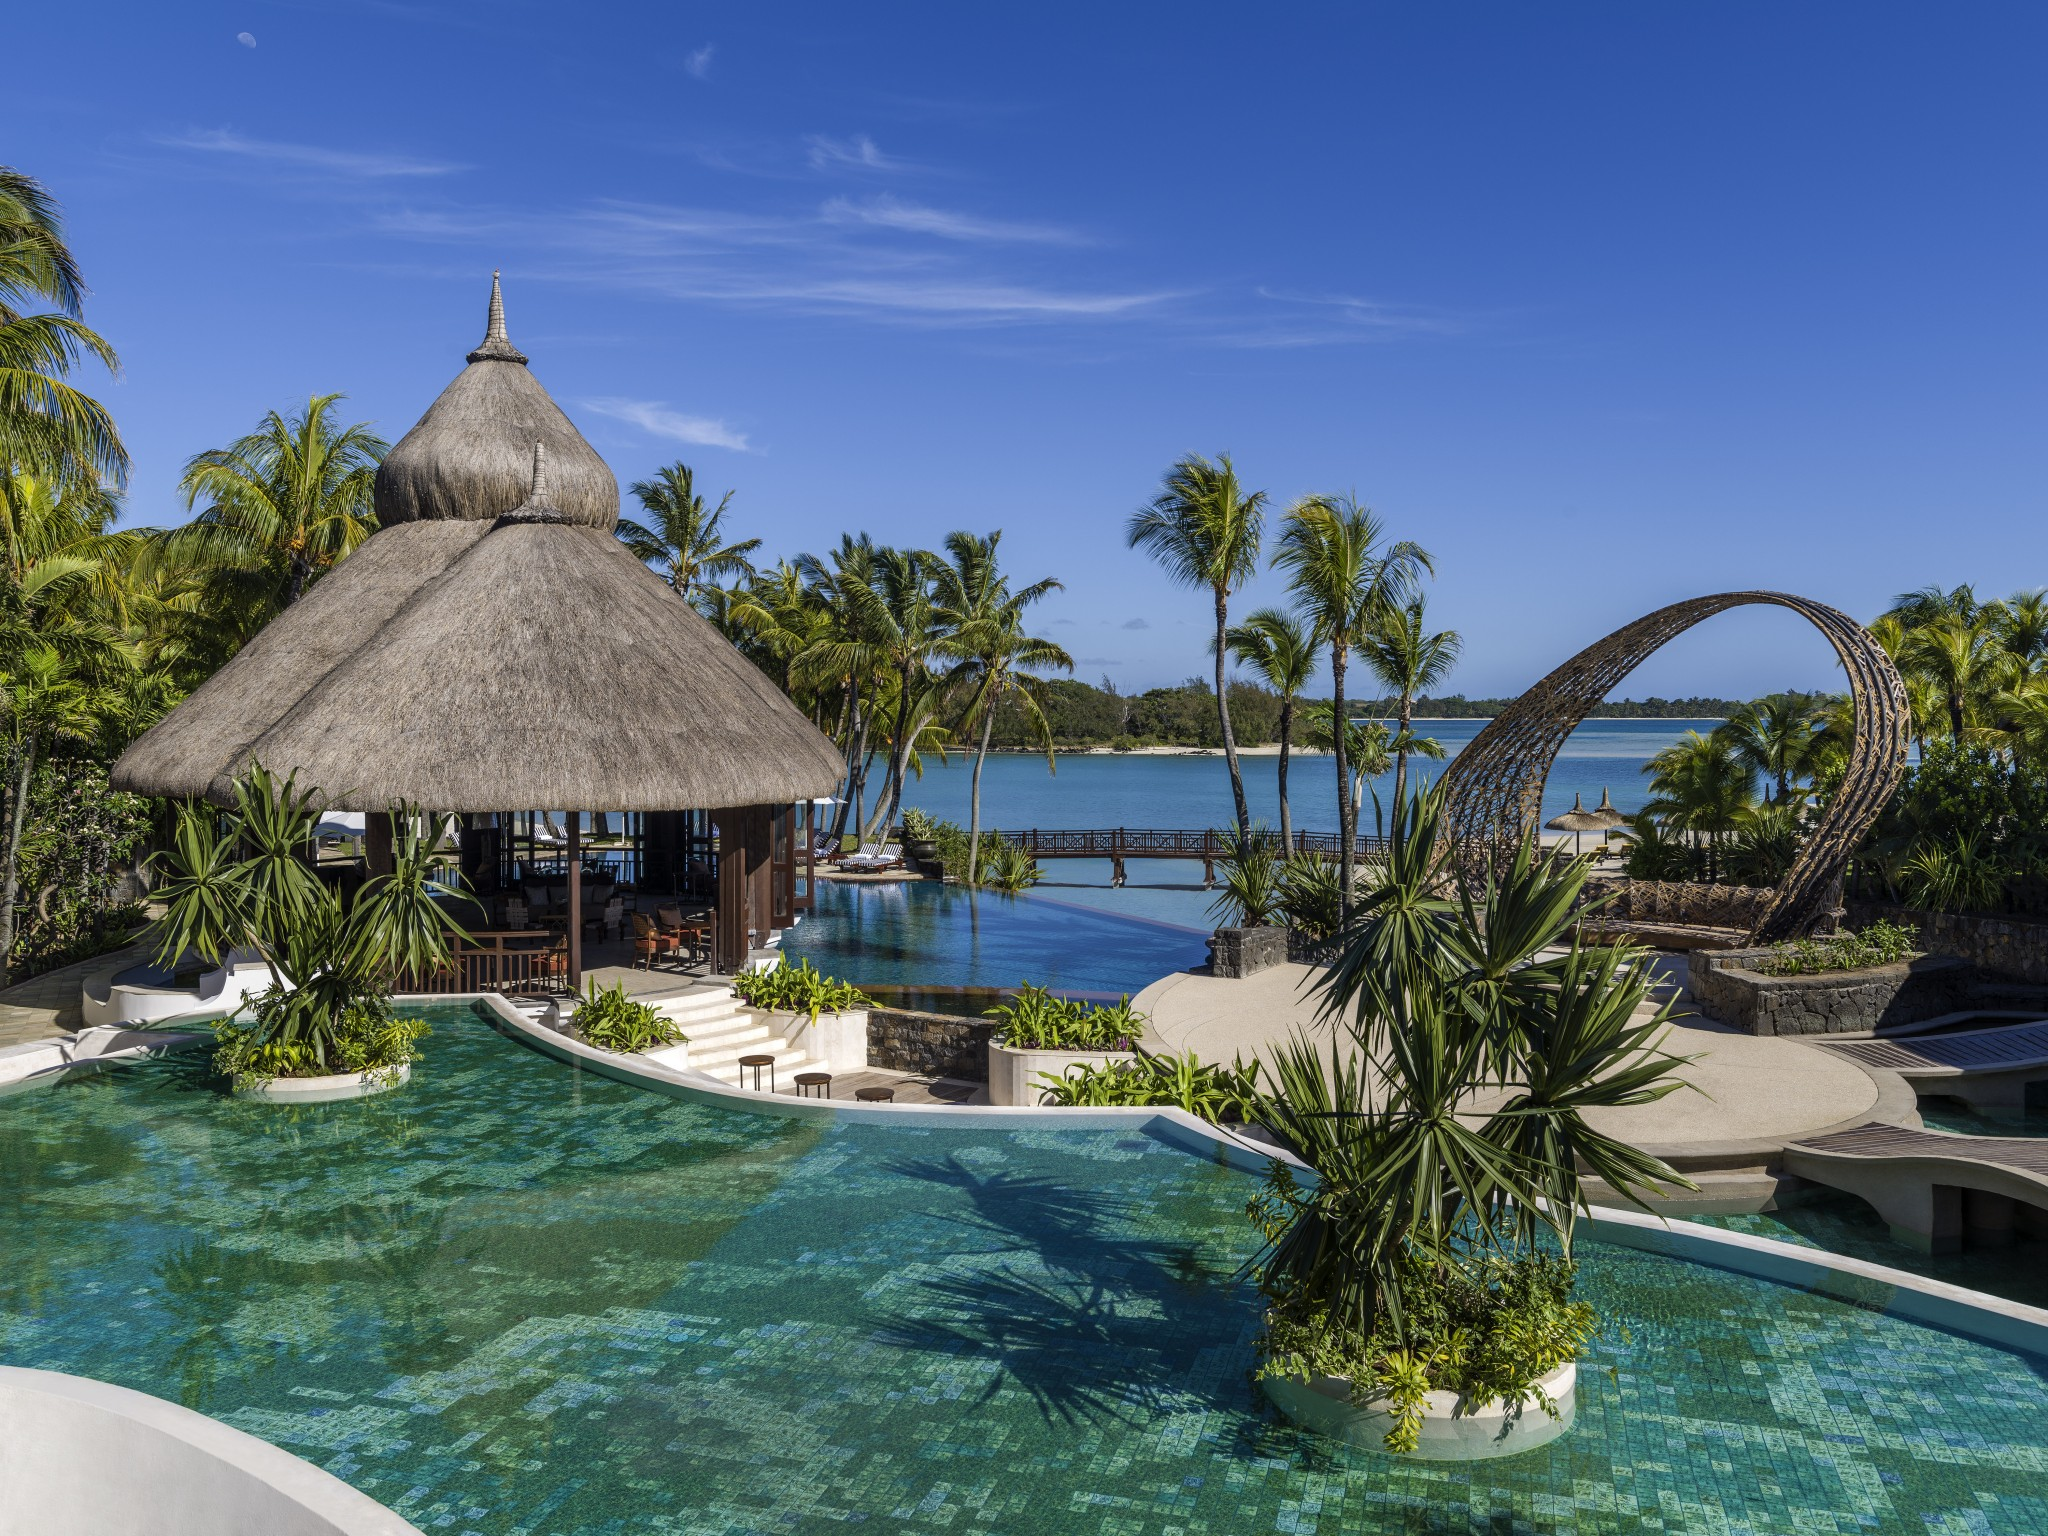 Mauritius: Familienarrangement im Shangri-La's Le Touessrok Resort & Spa